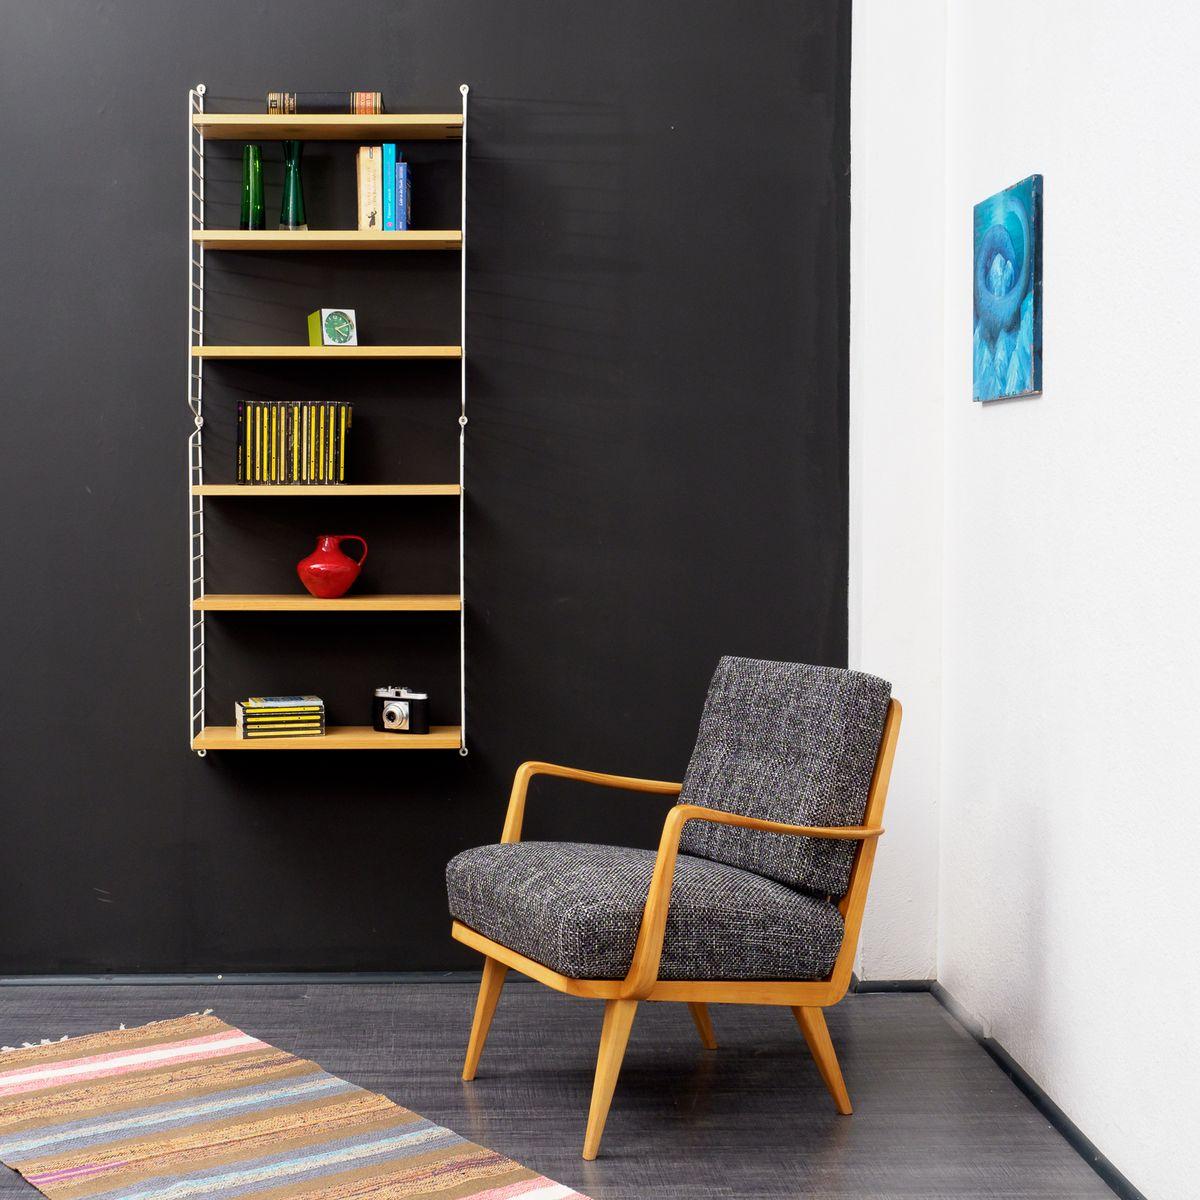 armlehnsessel aus kirschholz 1950er bei pamono kaufen. Black Bedroom Furniture Sets. Home Design Ideas